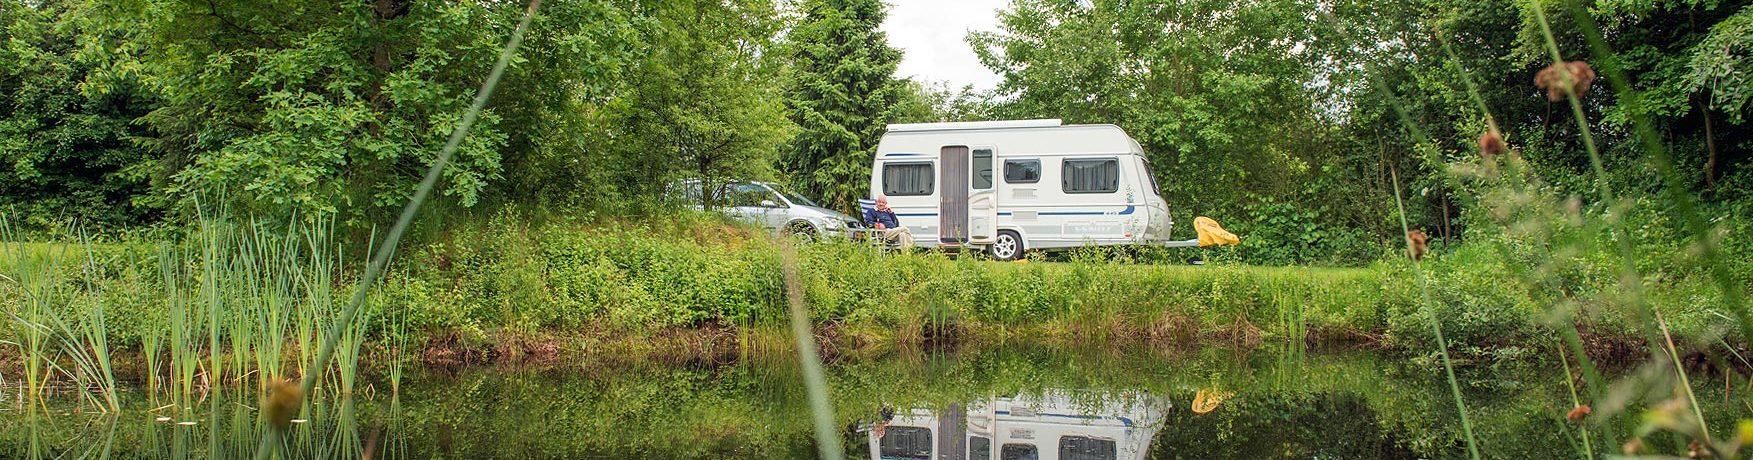 Landgoed Tolhek in ist ein Charme Camping in Drente am Wald.